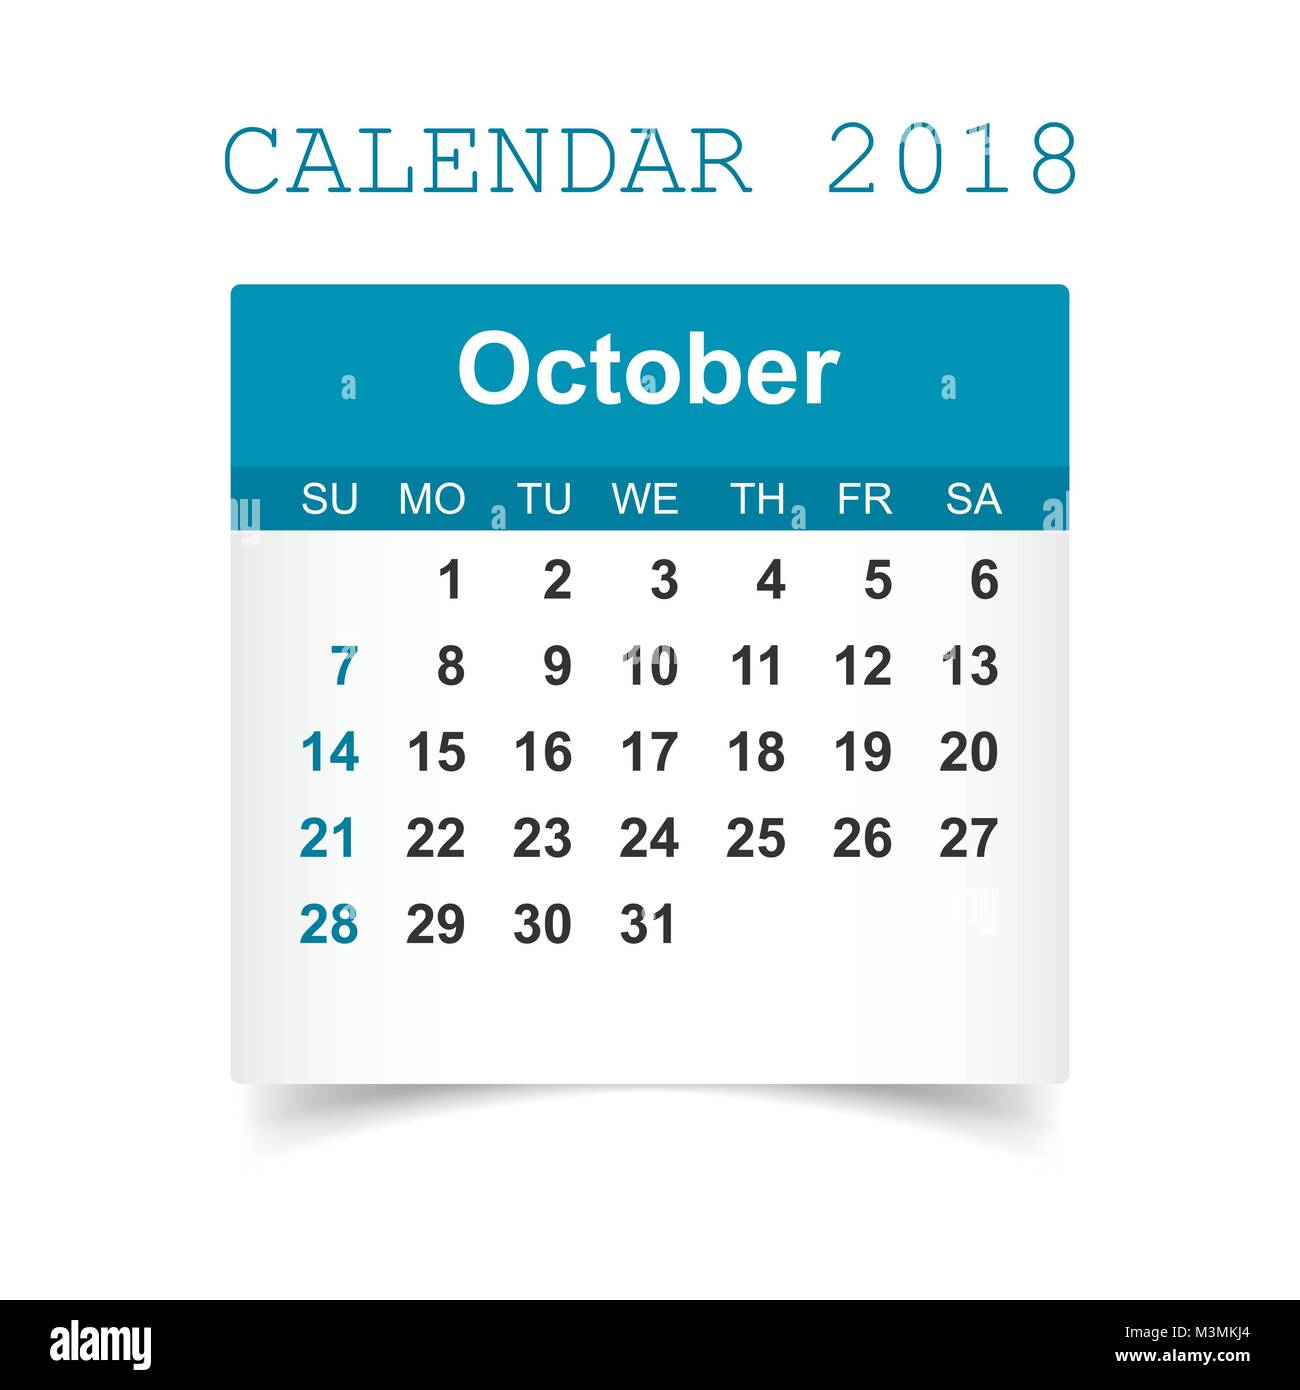 october 2018 calendar calendar sticker design template week starts on sunday business vector illustration